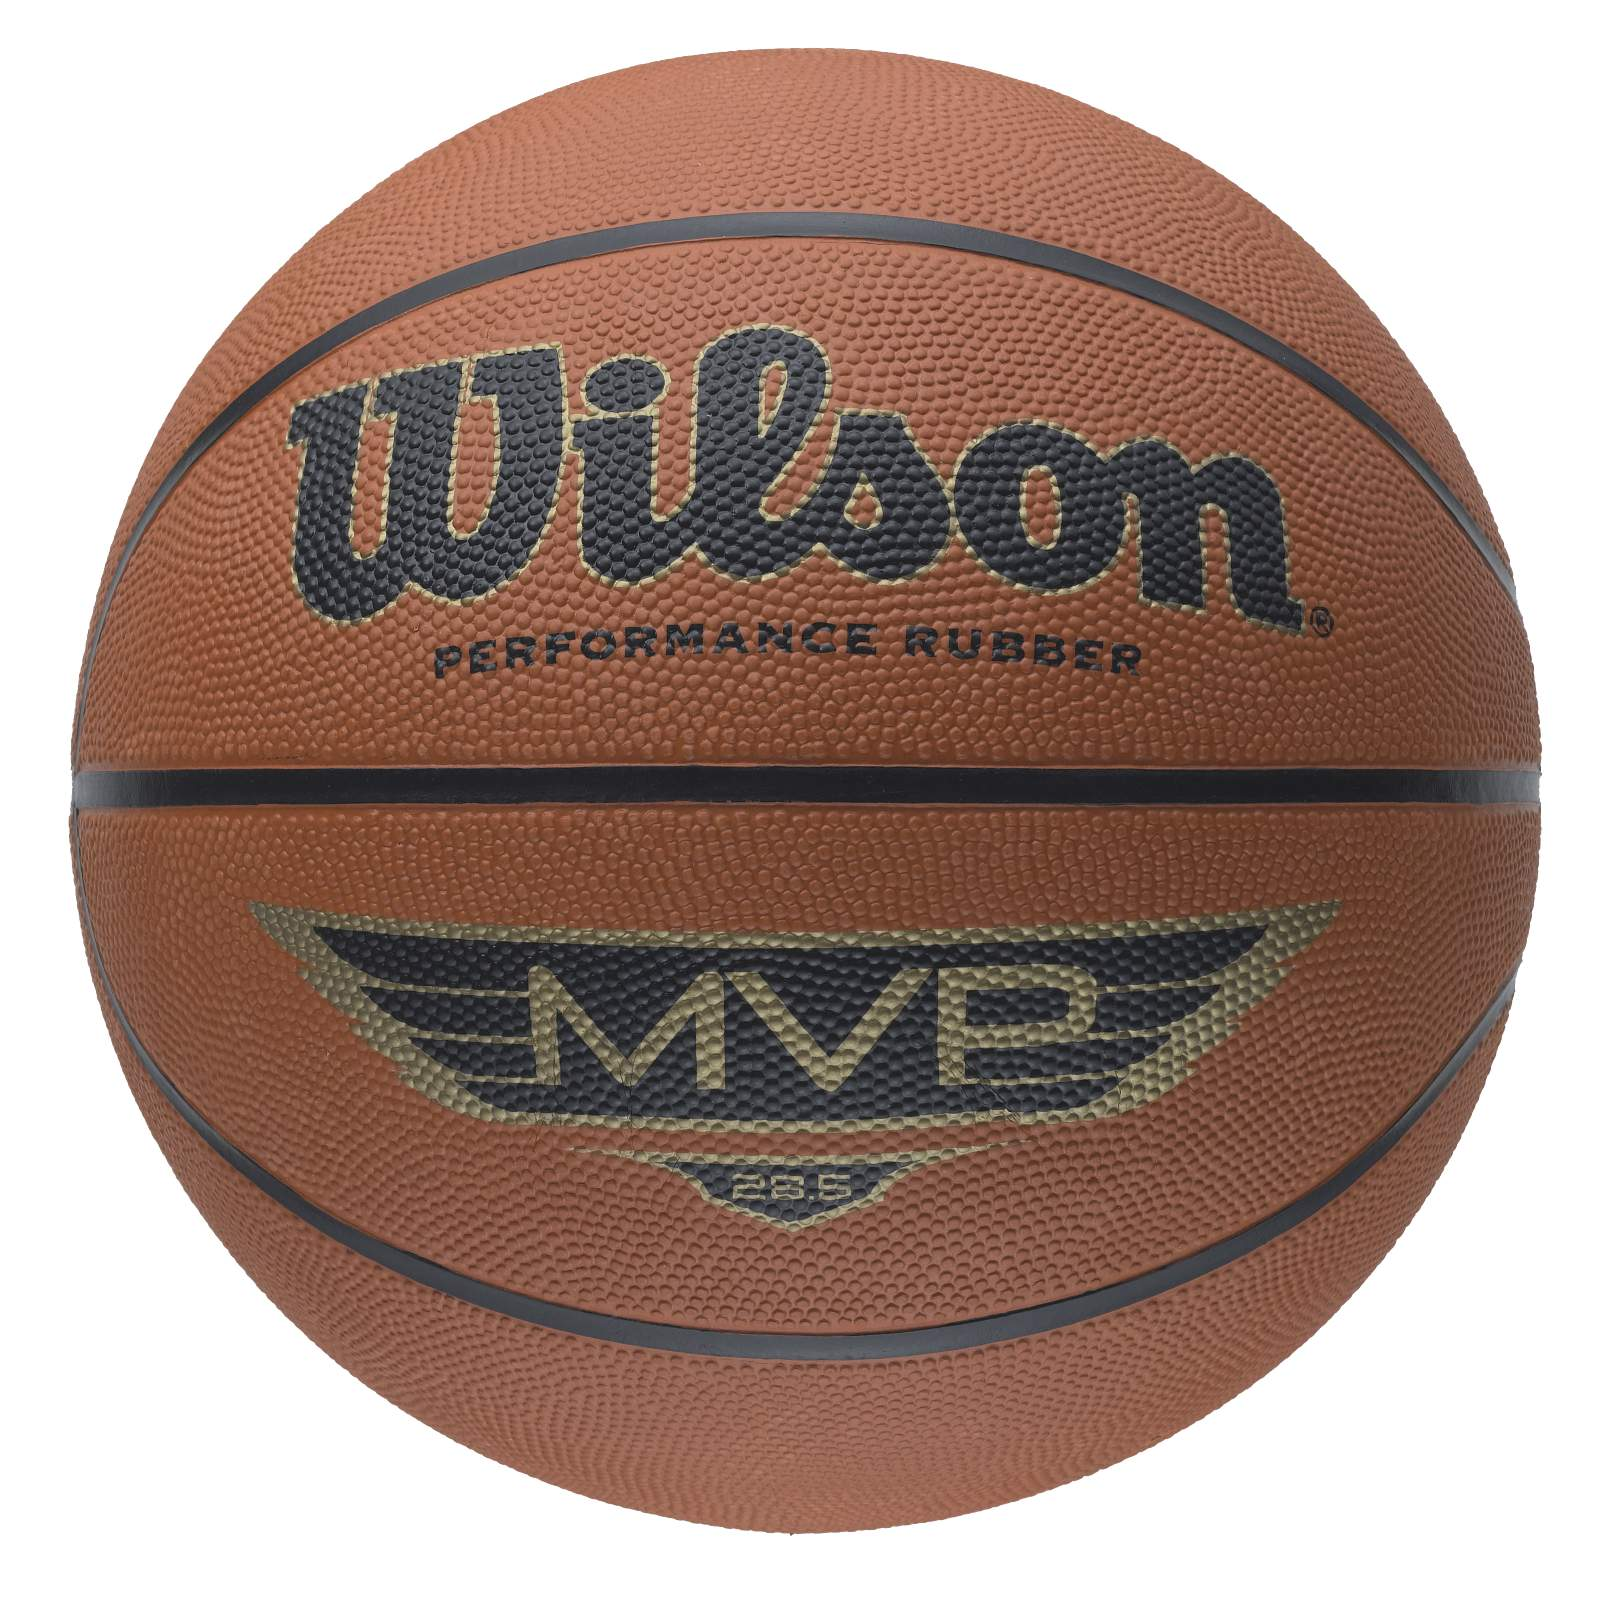 WILSON basketbola bumba MVP bumba